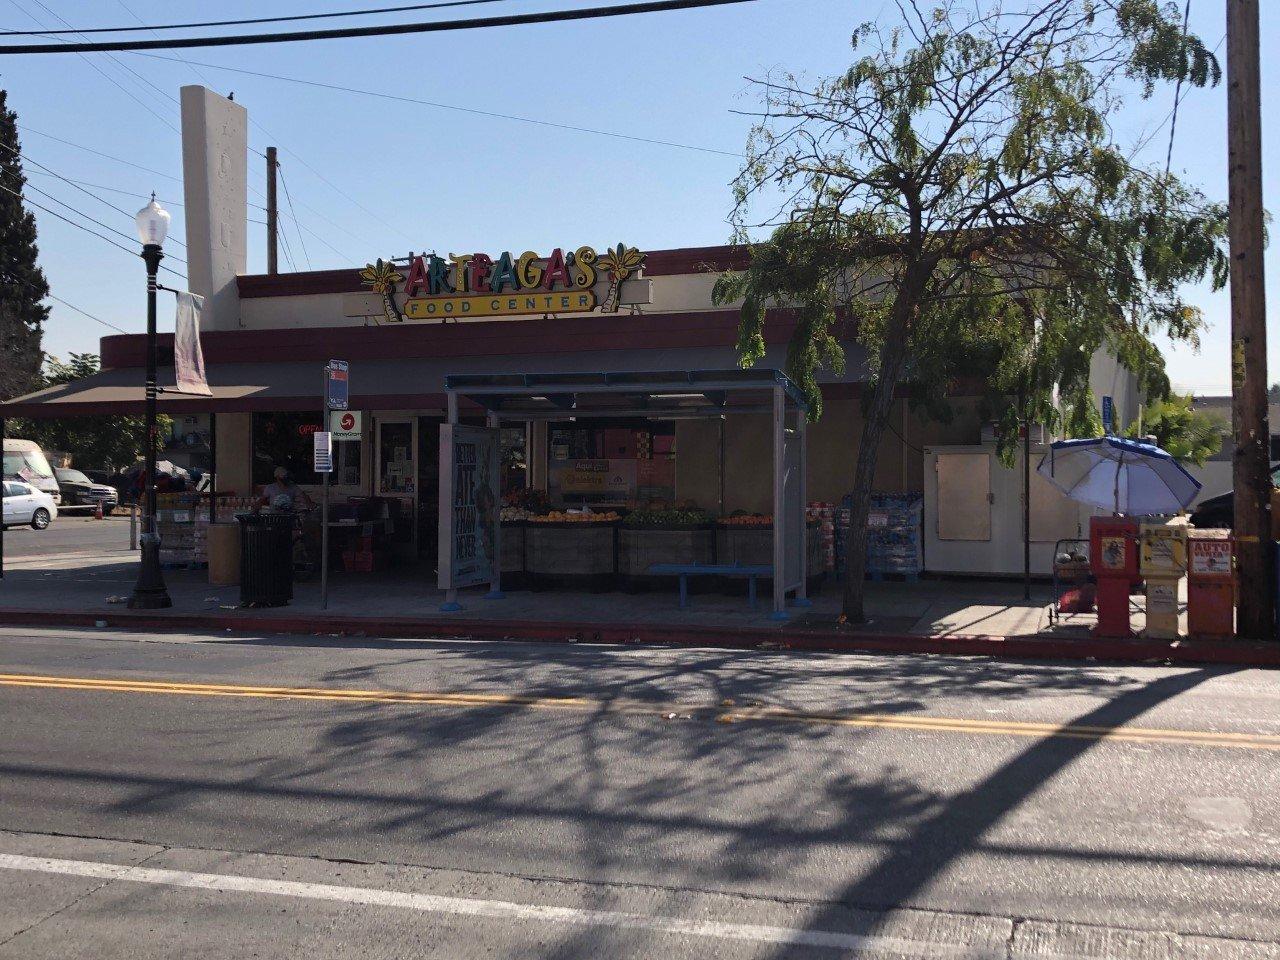 Storefront | Arteaga's Food Center | Mexican Grocery Store | Taqueria | Mexican Super Market